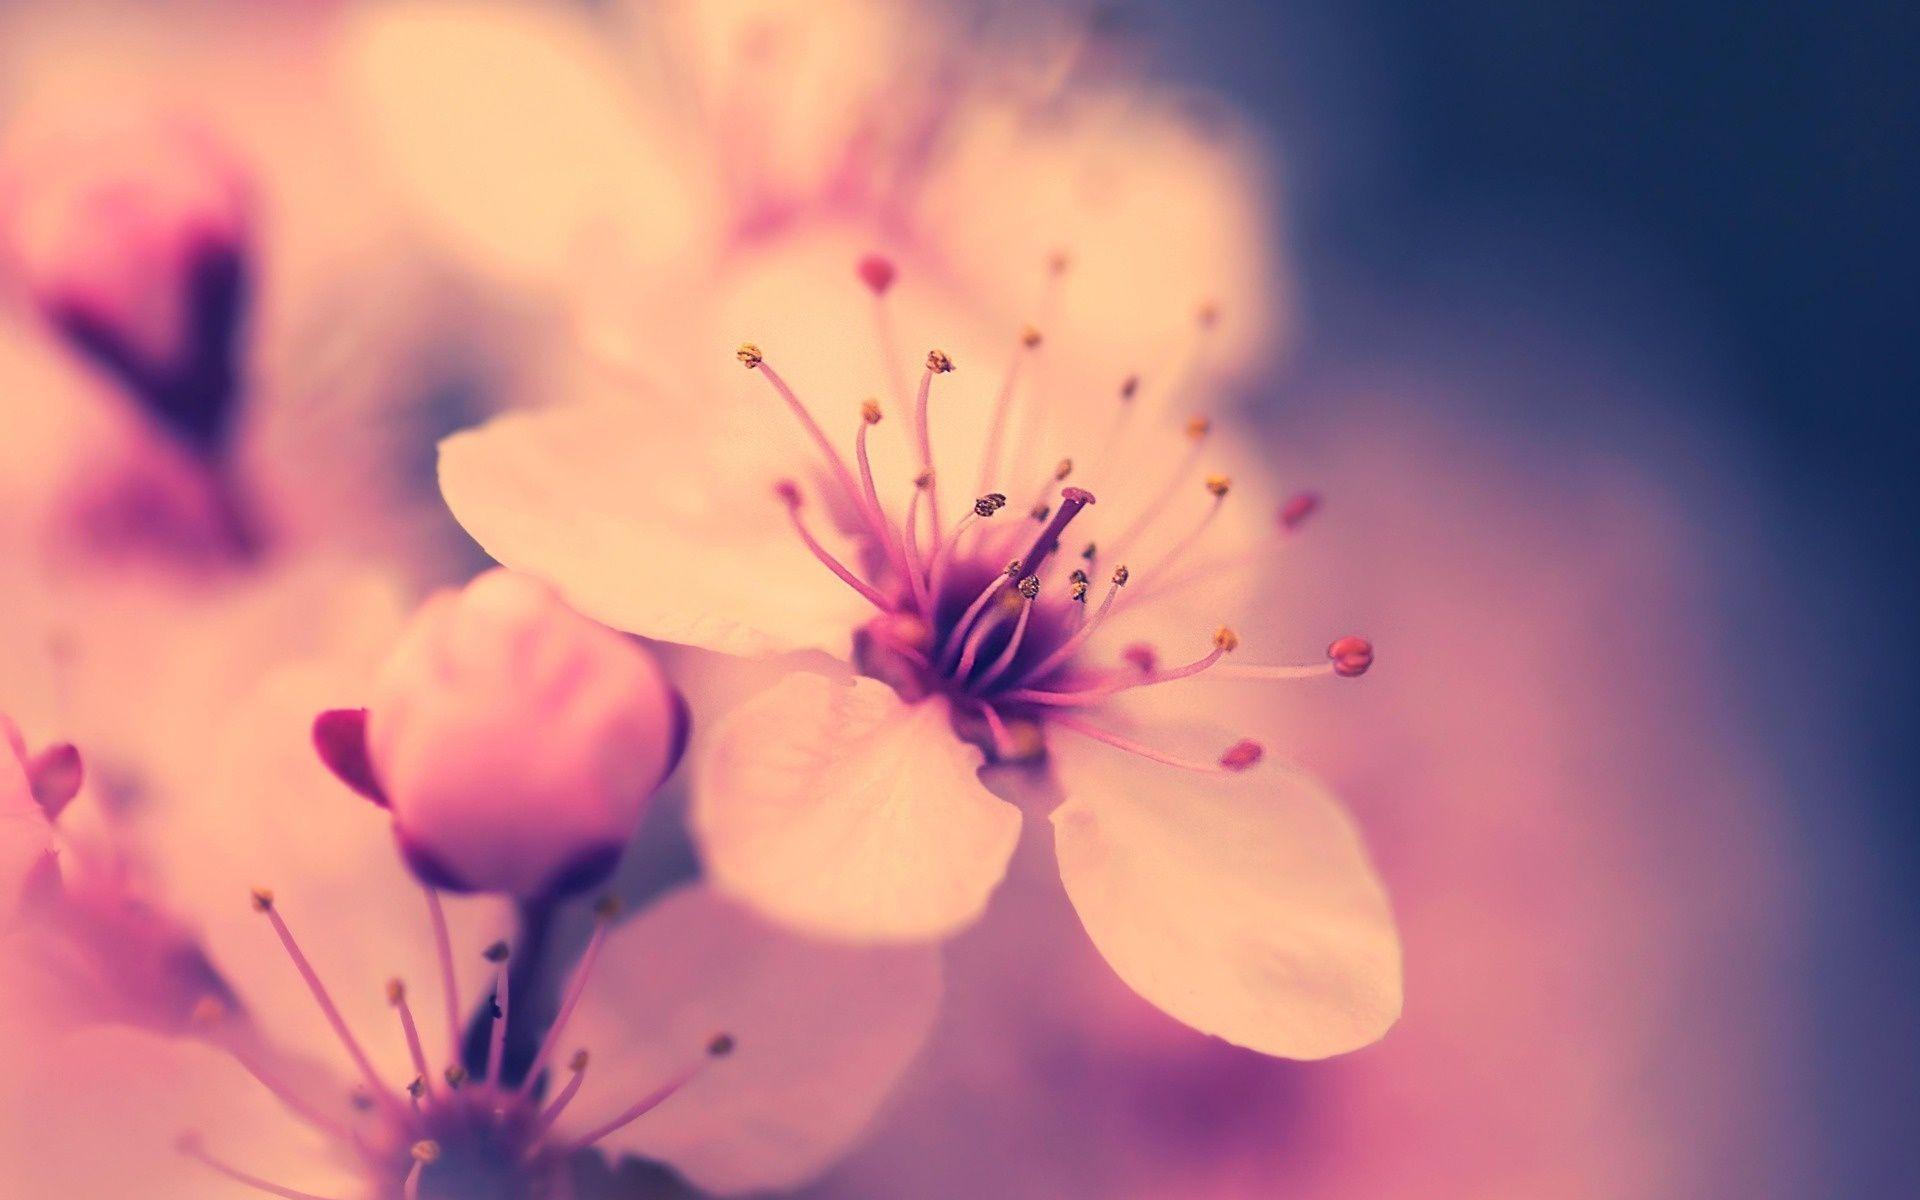 Desktop wallpaper sakura flower